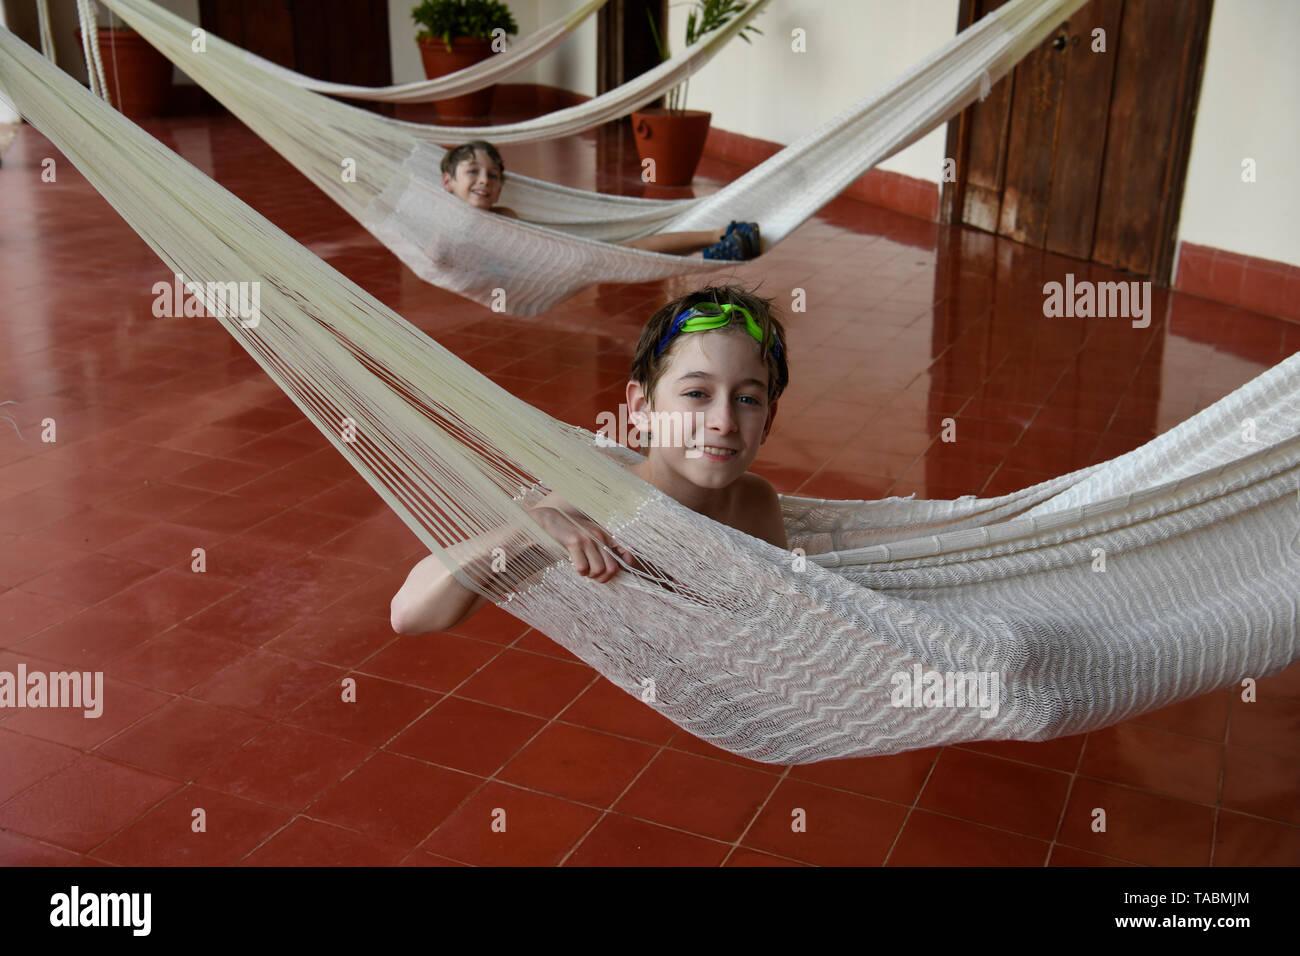 Boy in Mexican hammock having a siesta - Stock Image